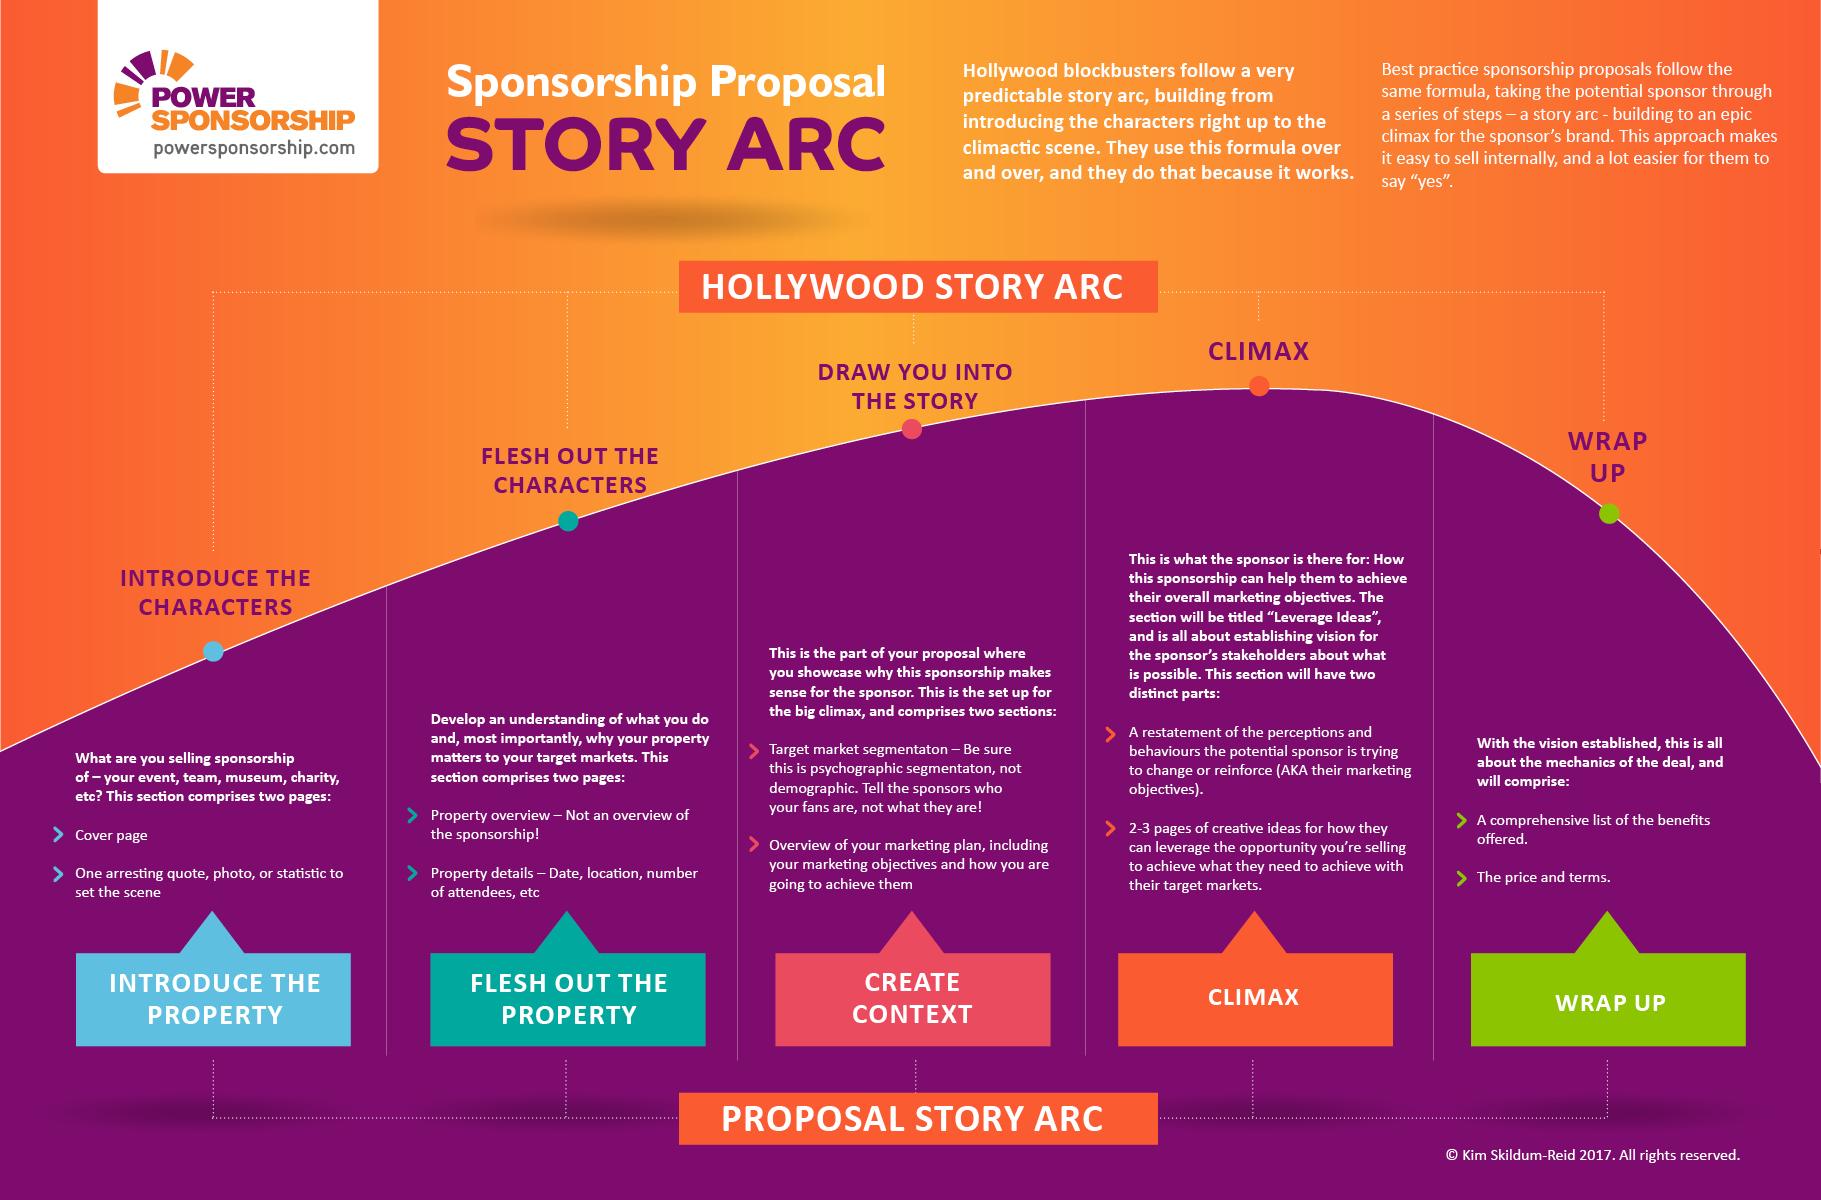 Sponsorship Proposal Story Arc